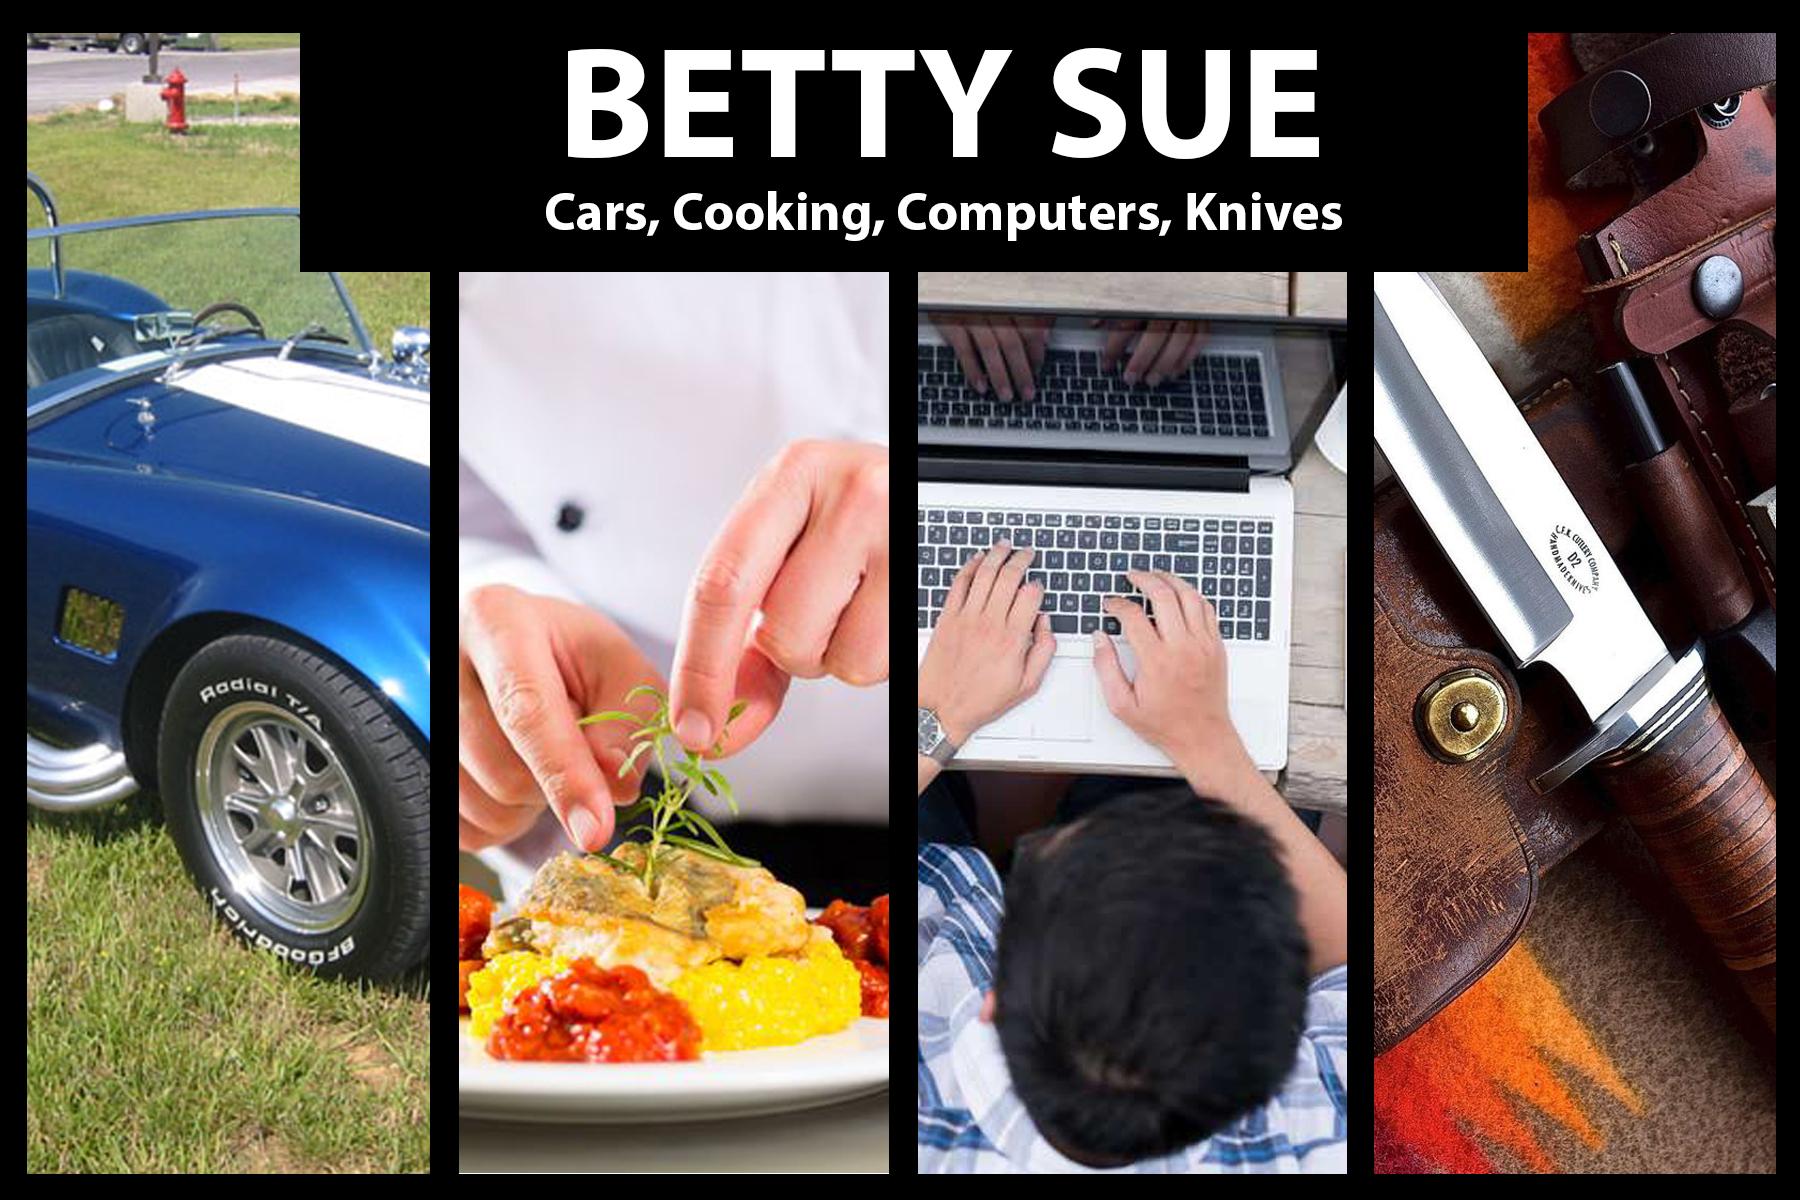 BettySue